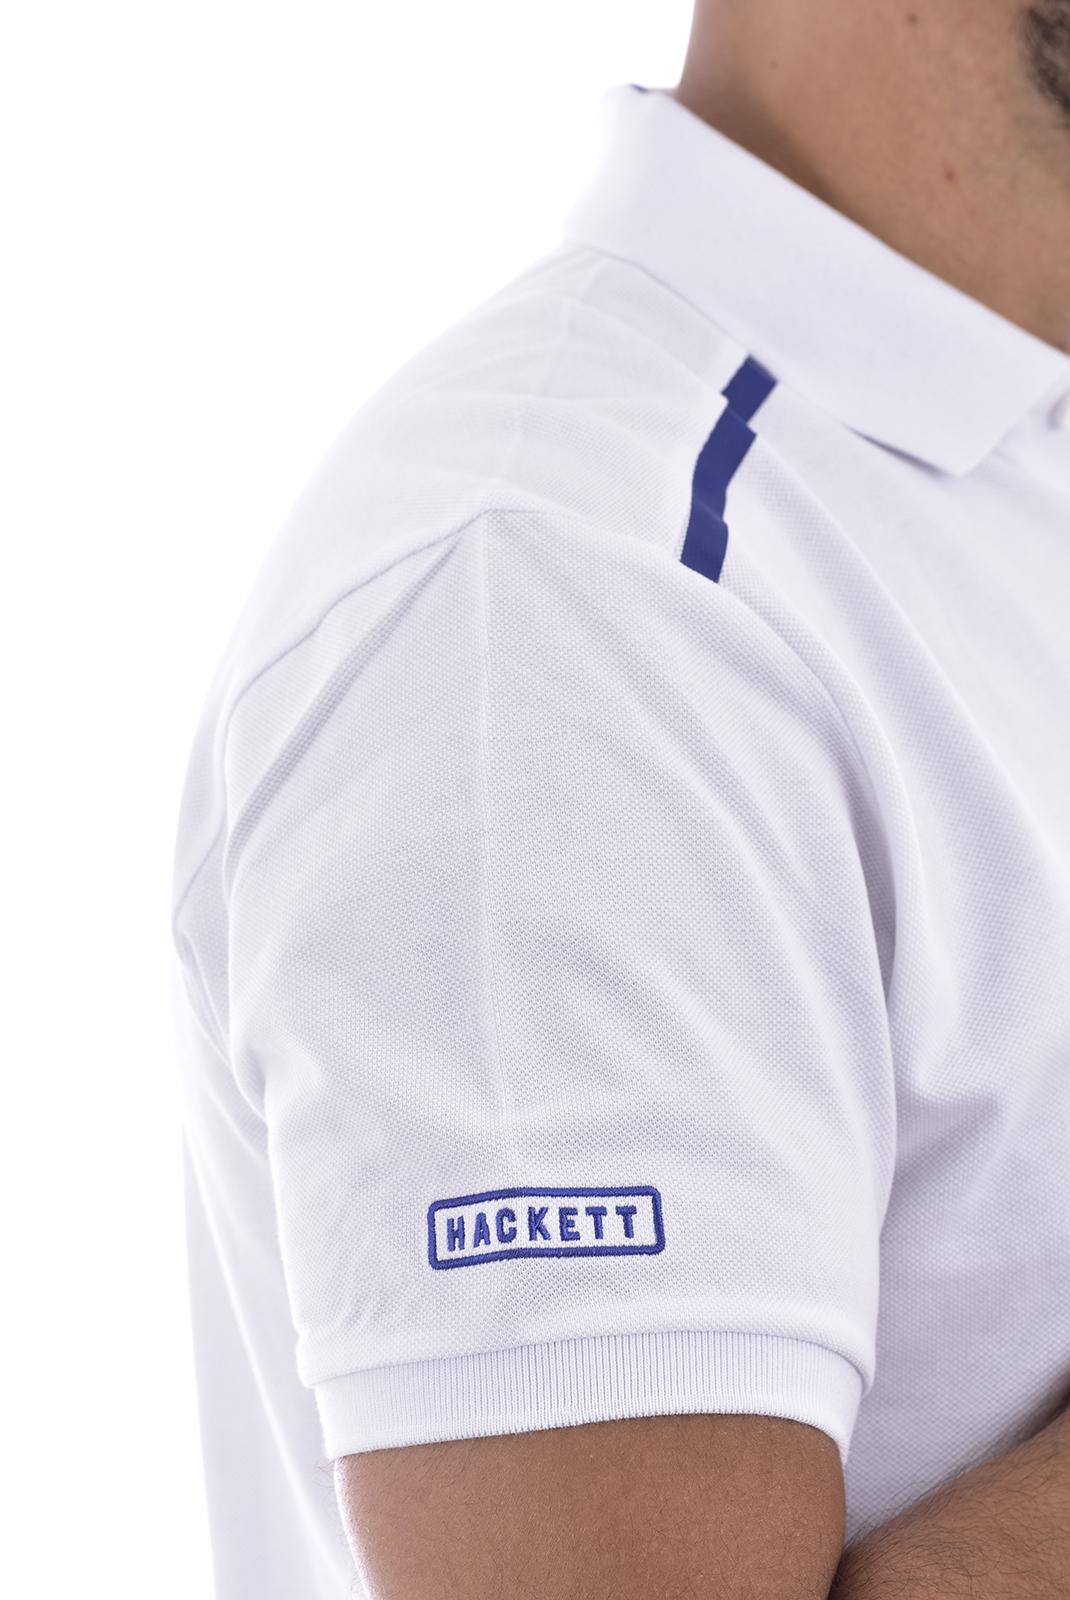 Polos  Hackett london HM562683 8AS blanc